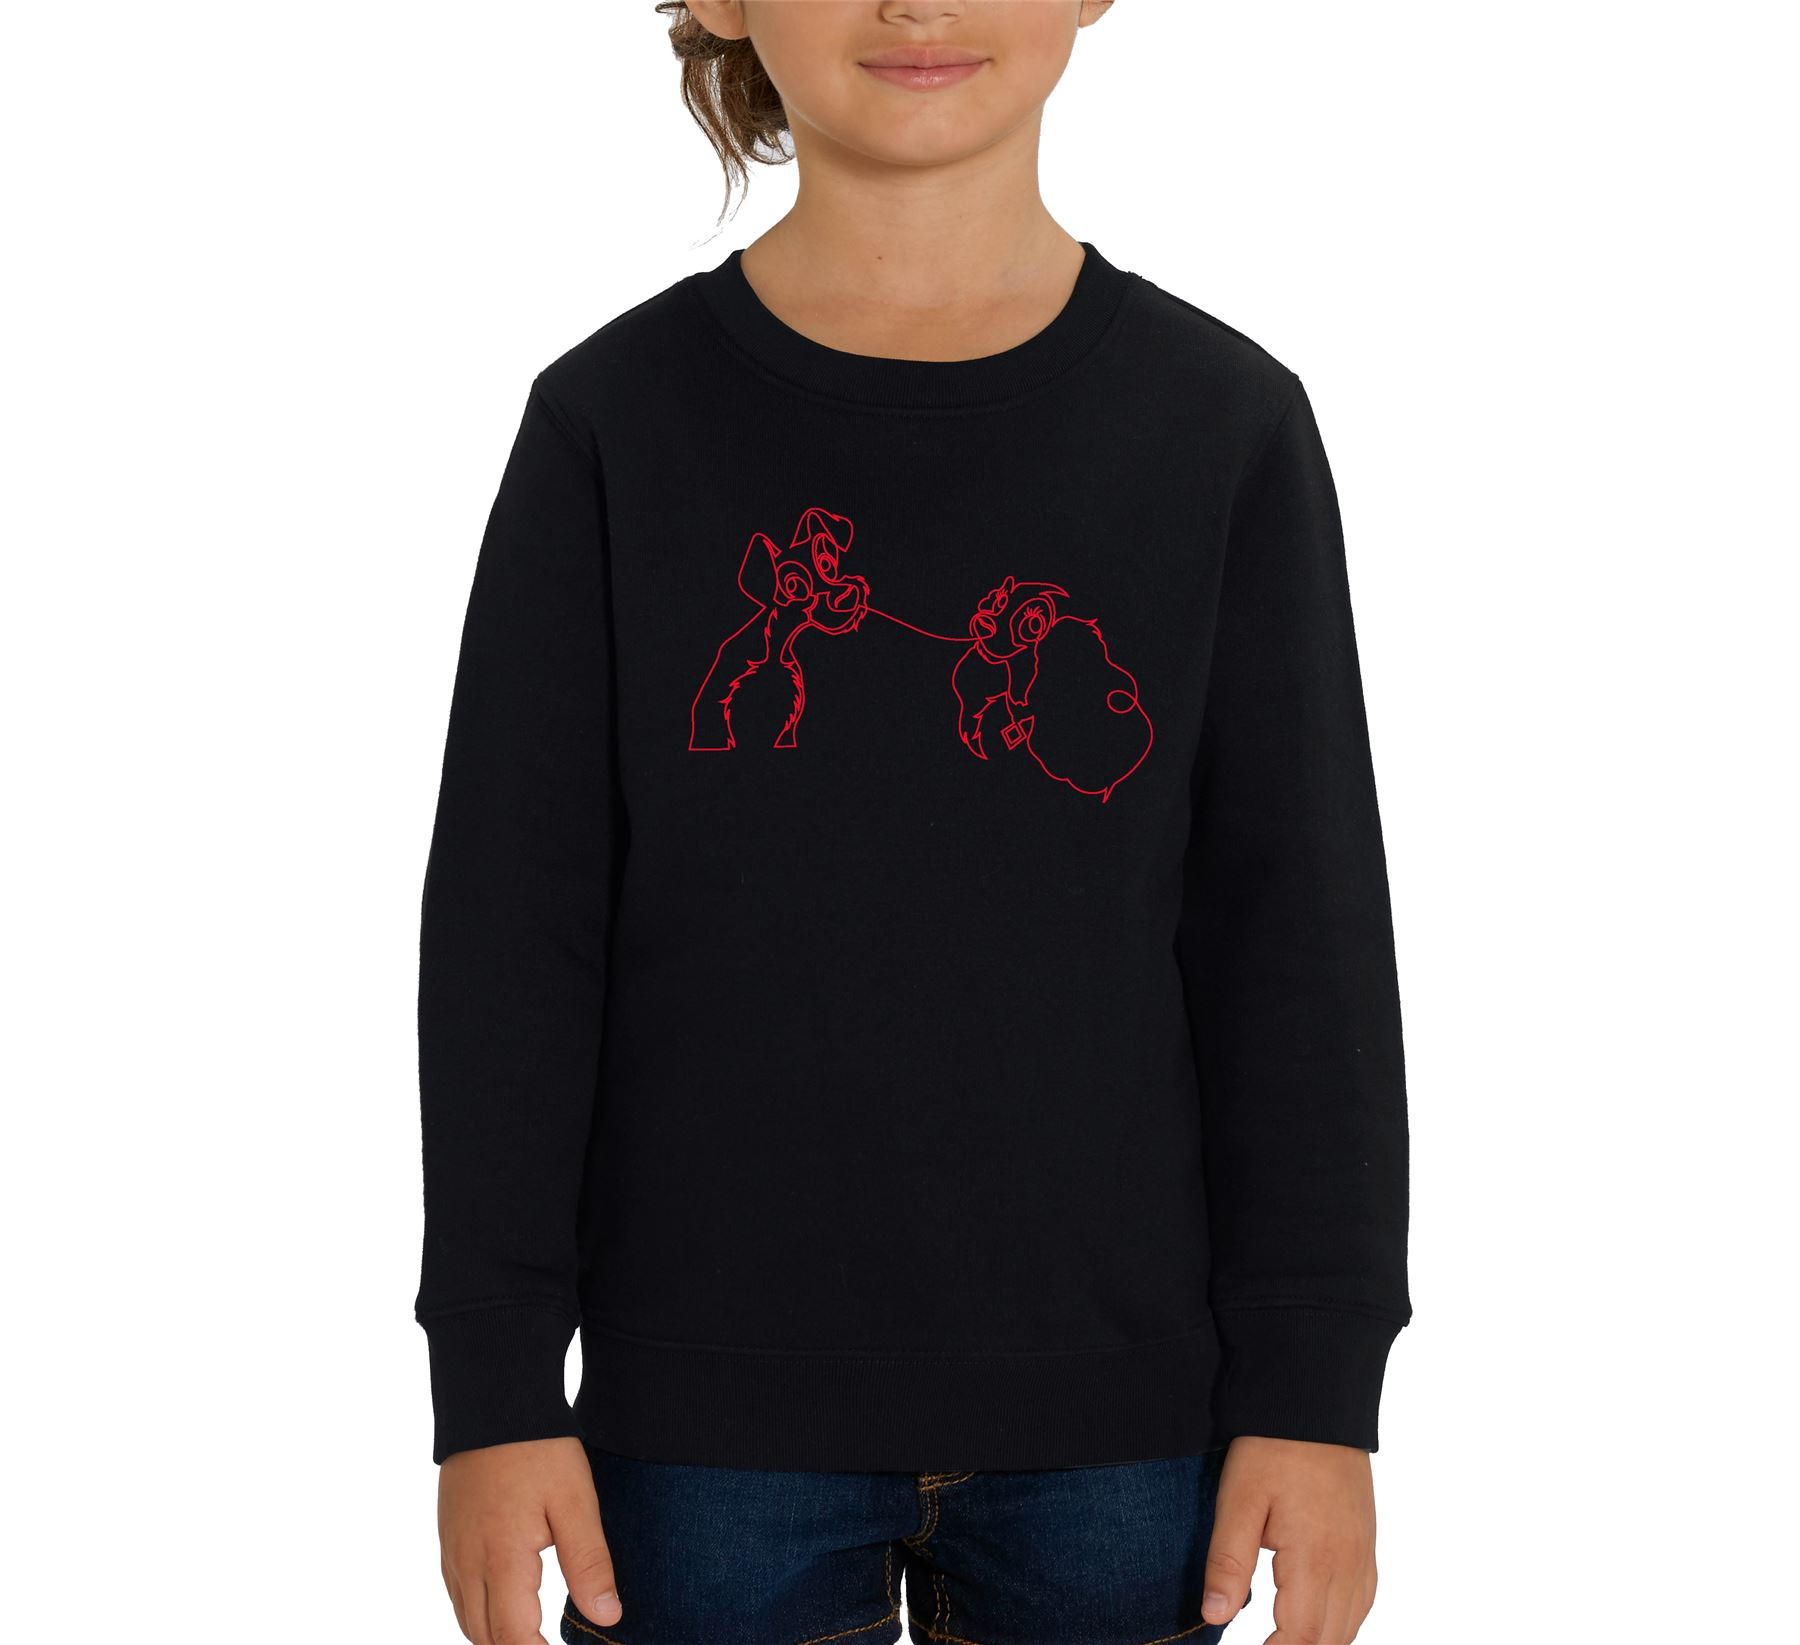 Disney Classic Lady The Tramp Outline Children S Unisex Black Sweatshirt Ebay